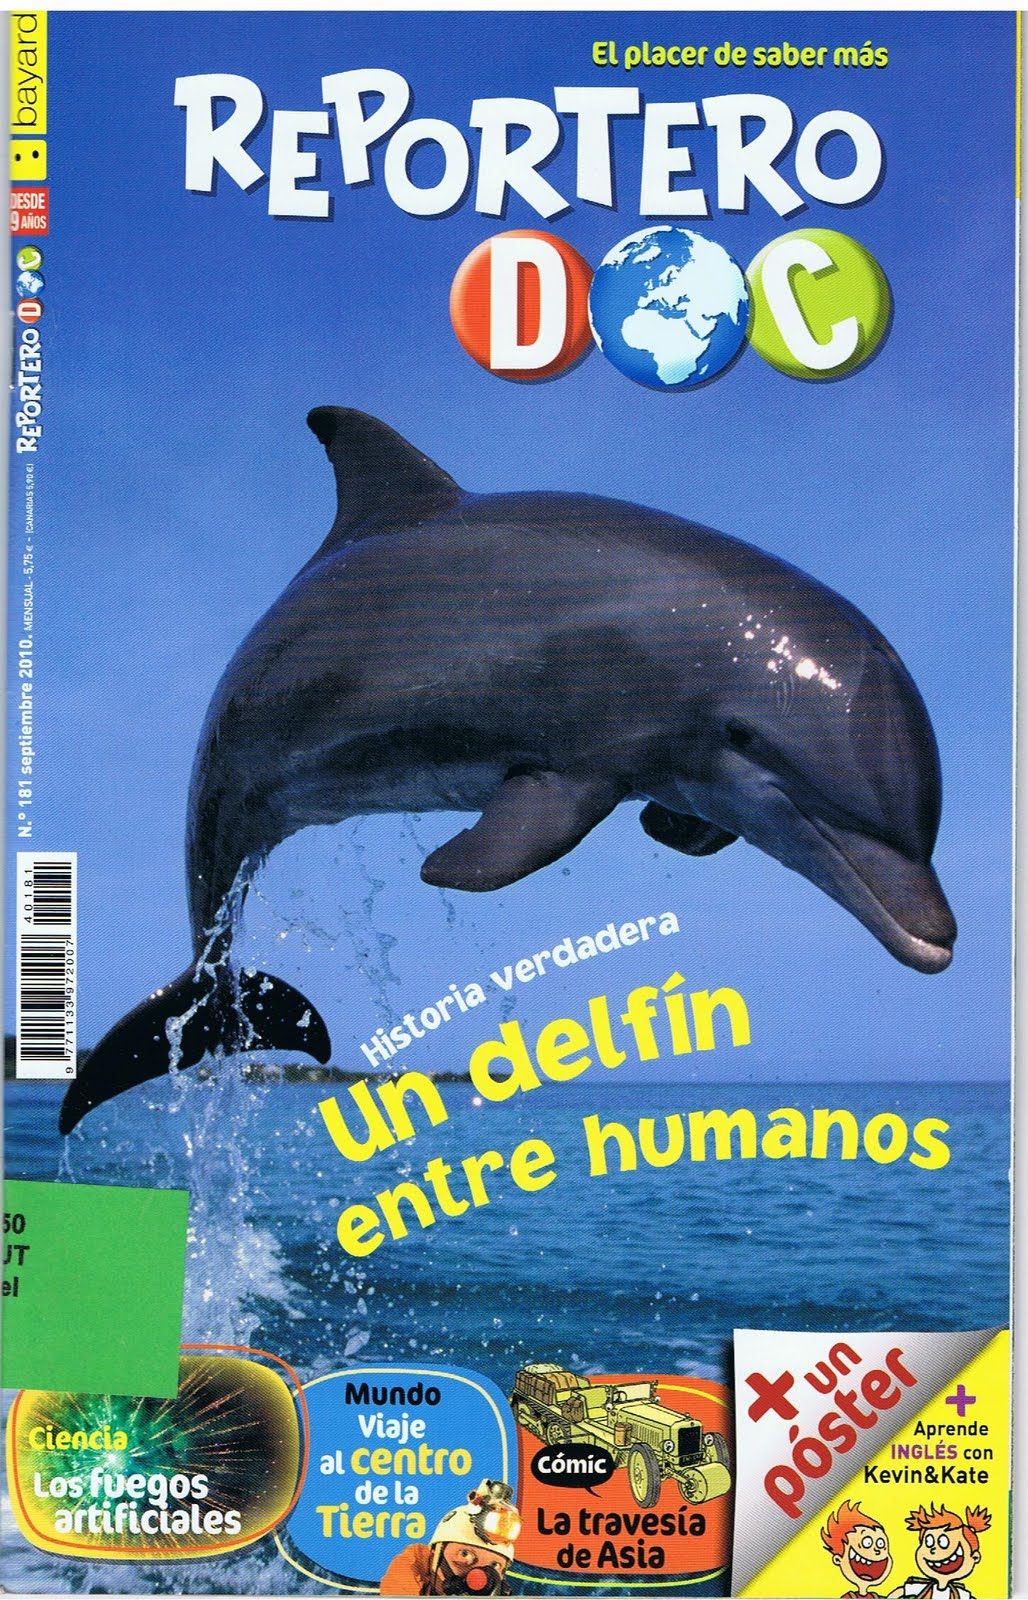 http://bridginglearning.psyed.edu.es/wp-content/uploads/2014/07/Reportero_doc.jpg